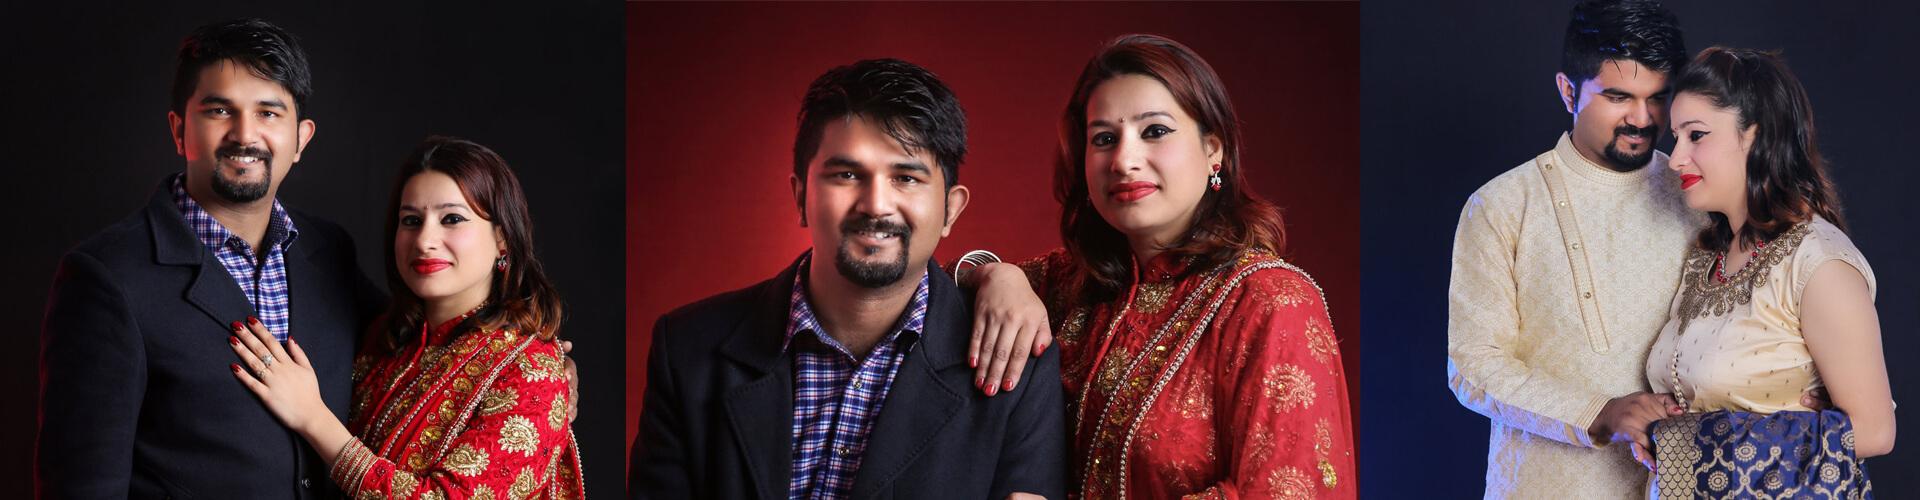 Bivek Dahal - Photoshoot by ImgStock Biratnagar